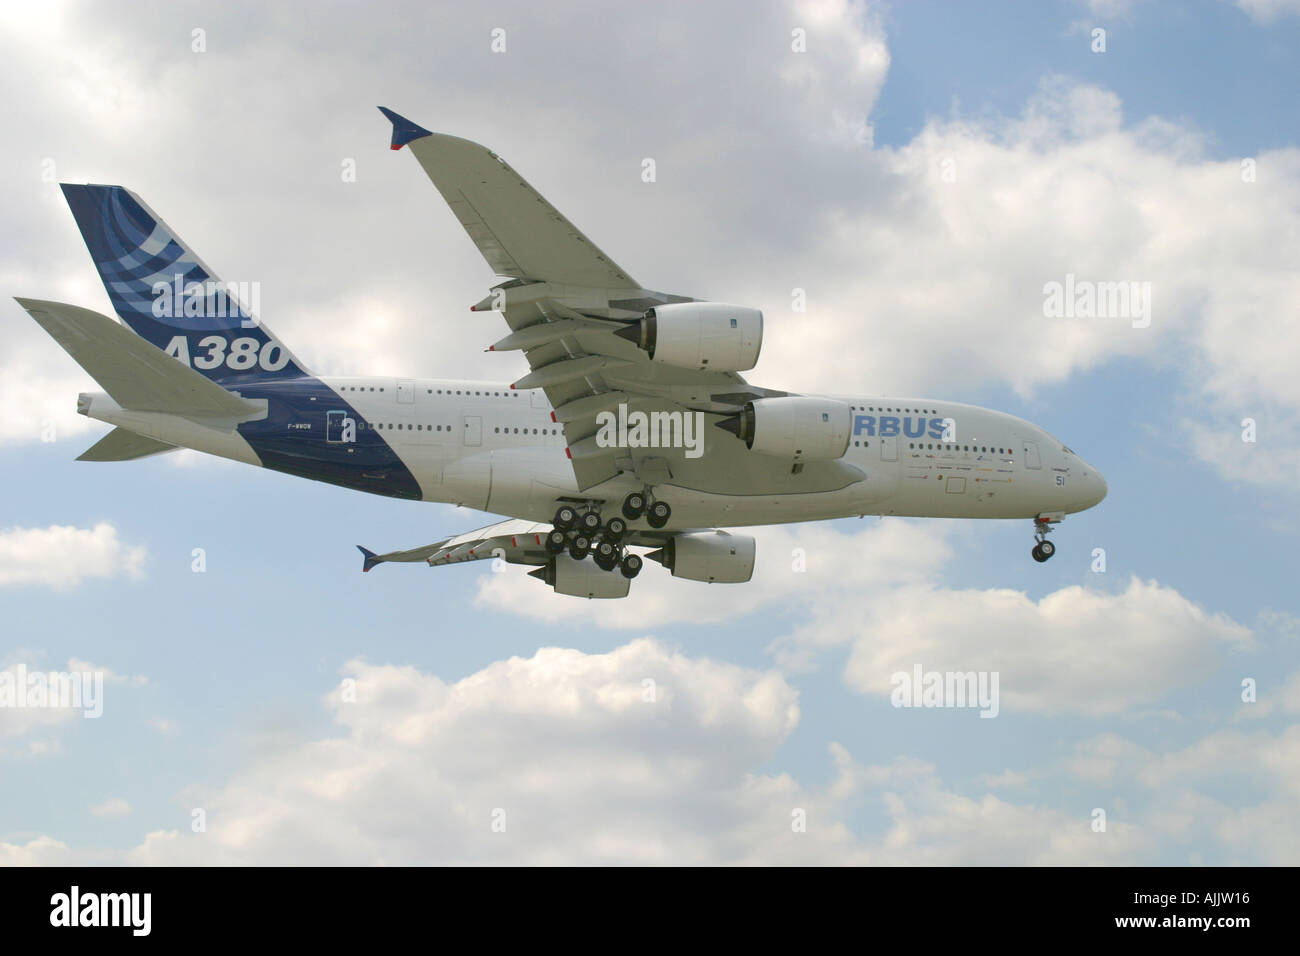 Airbus A380 super jumbo aircraft in flight at Paris Airshow 2005 - Stock Image